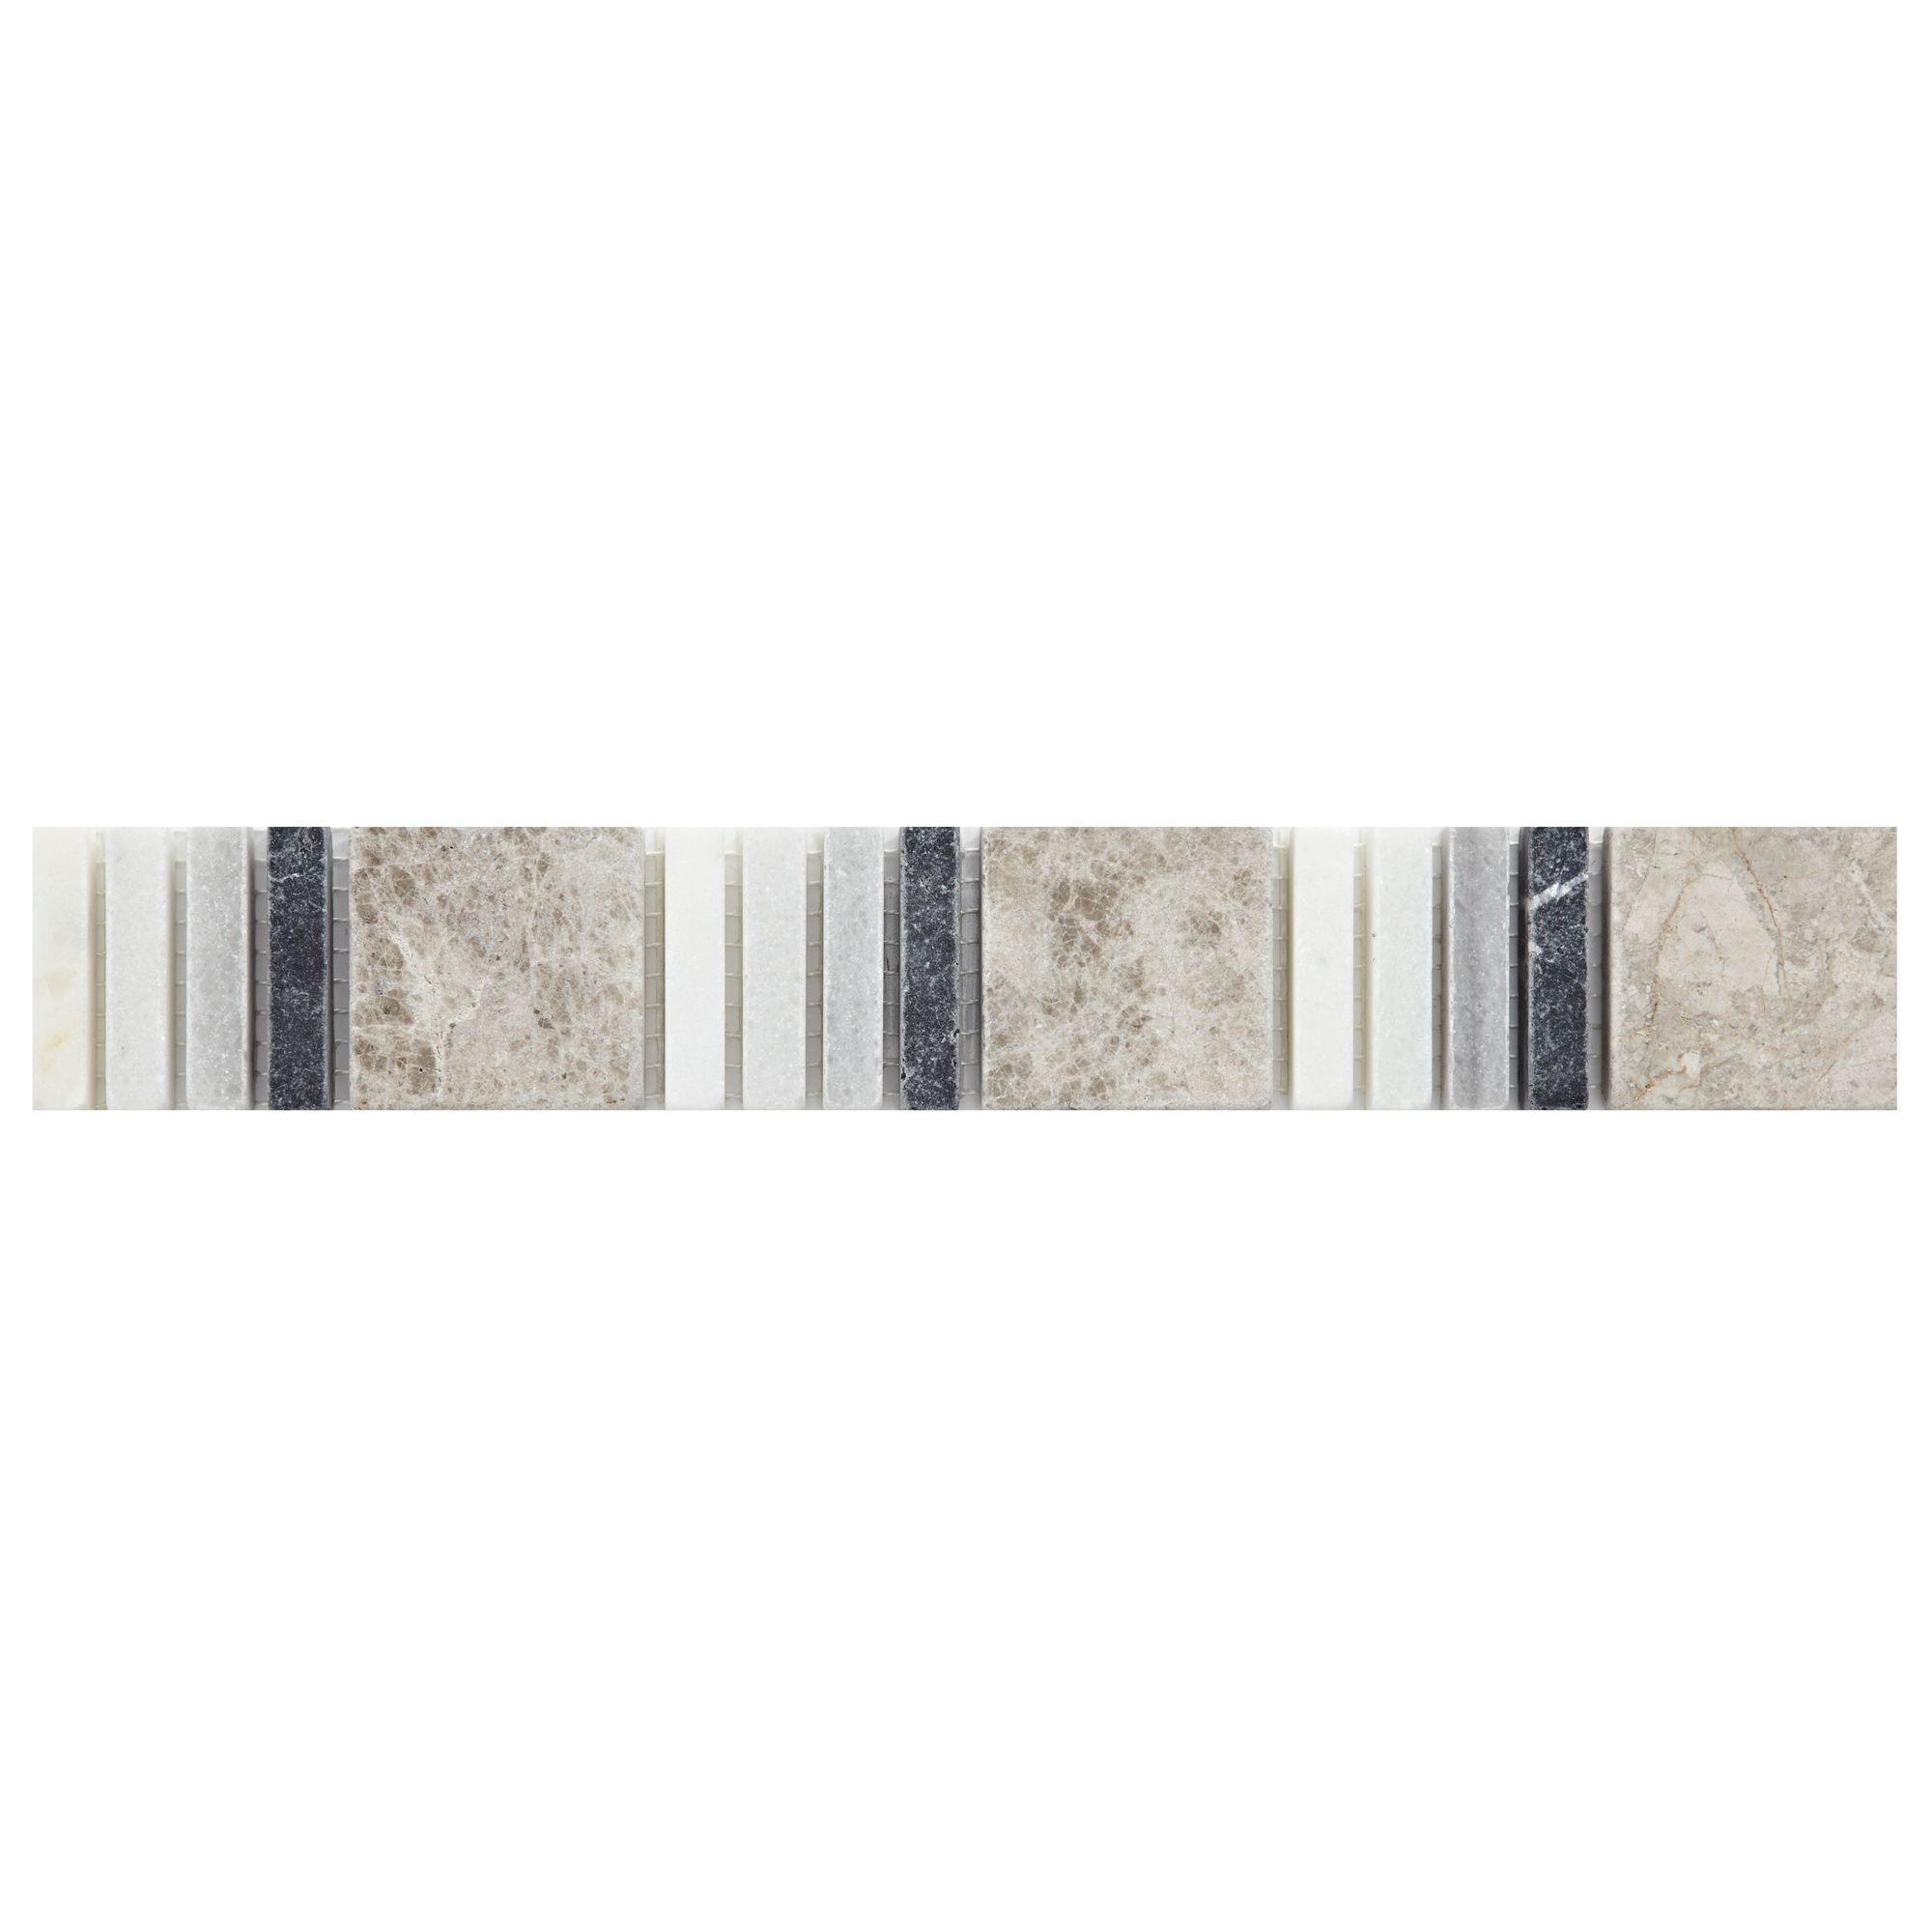 Black White Grey Mosaic Marble Border Tile L 305mm W 48mm